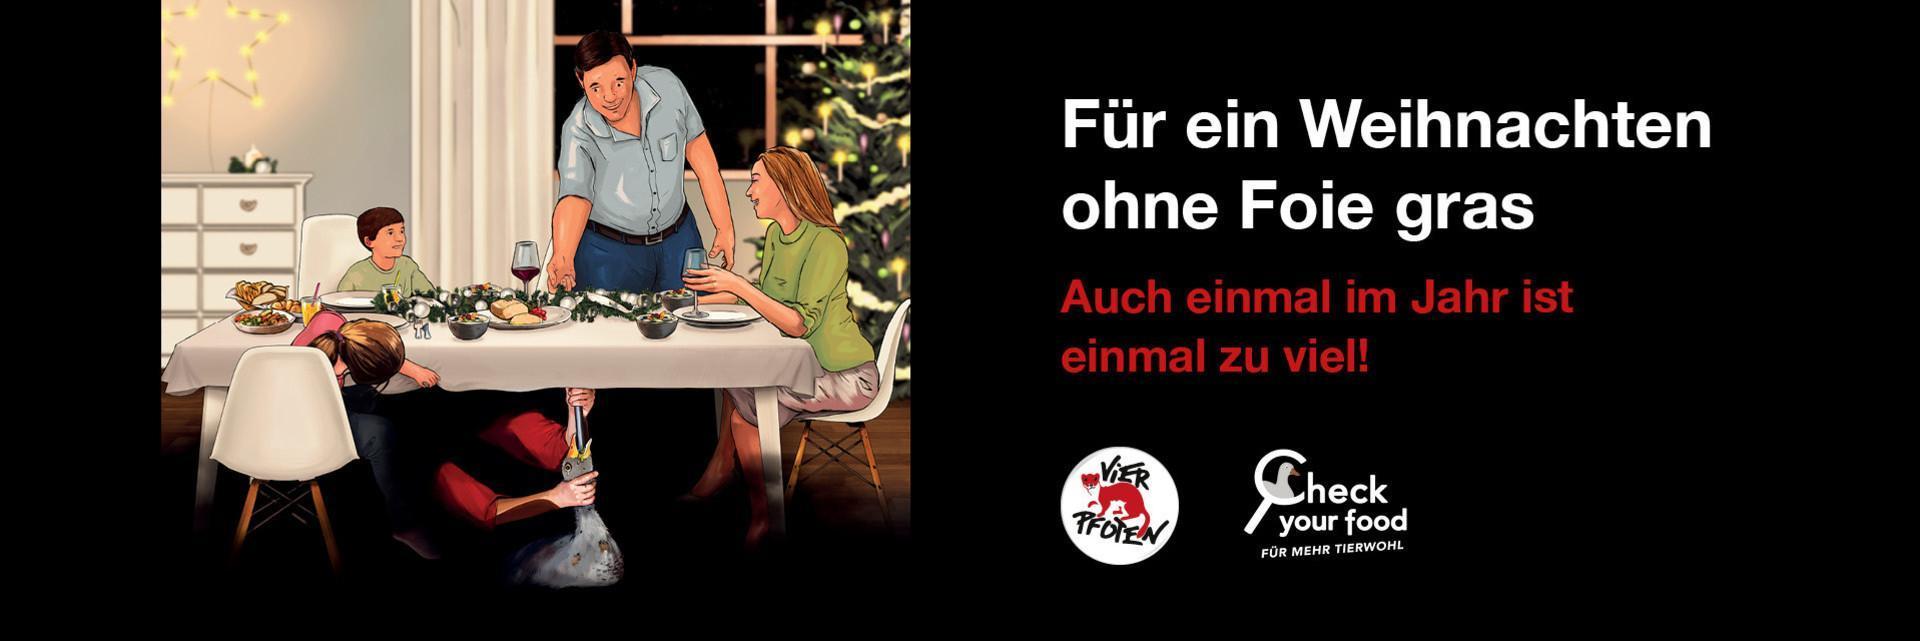 Kampagnenbild Foie gras